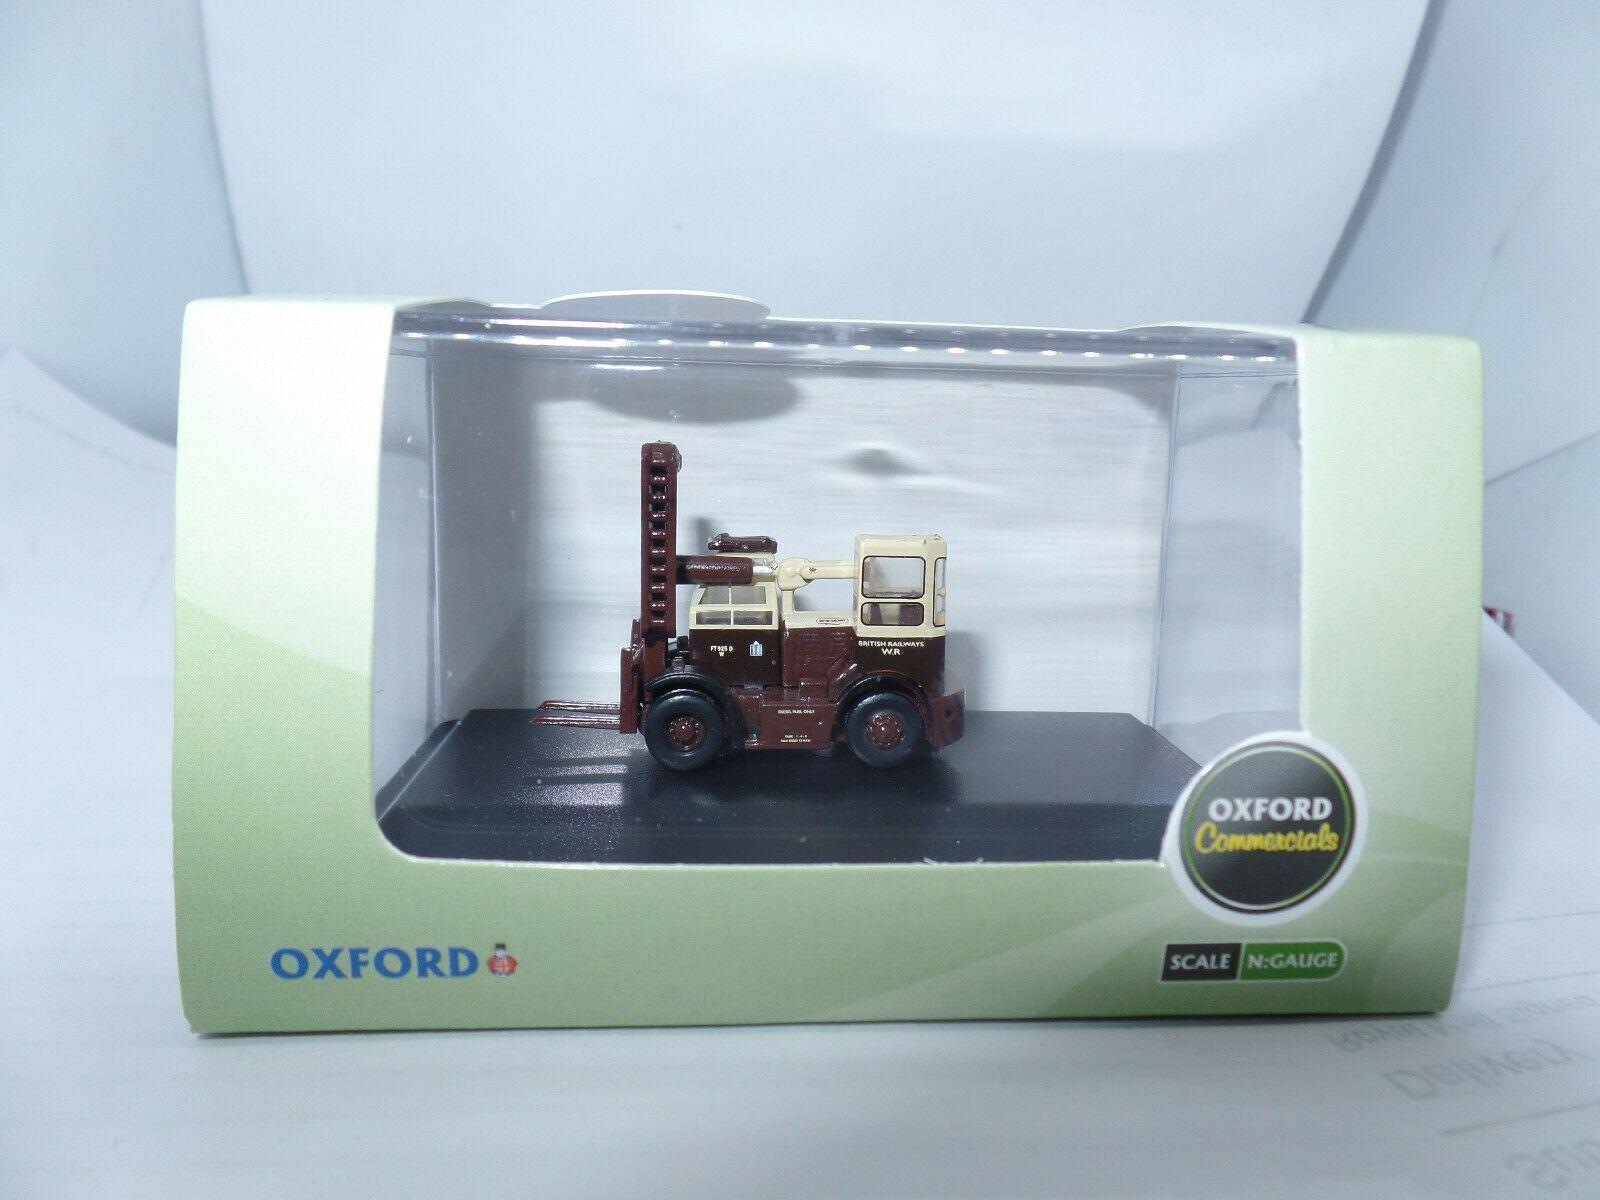 Oxford nsdf 002 N jauge Shelvoke /& Drewry freightlifter British Rail